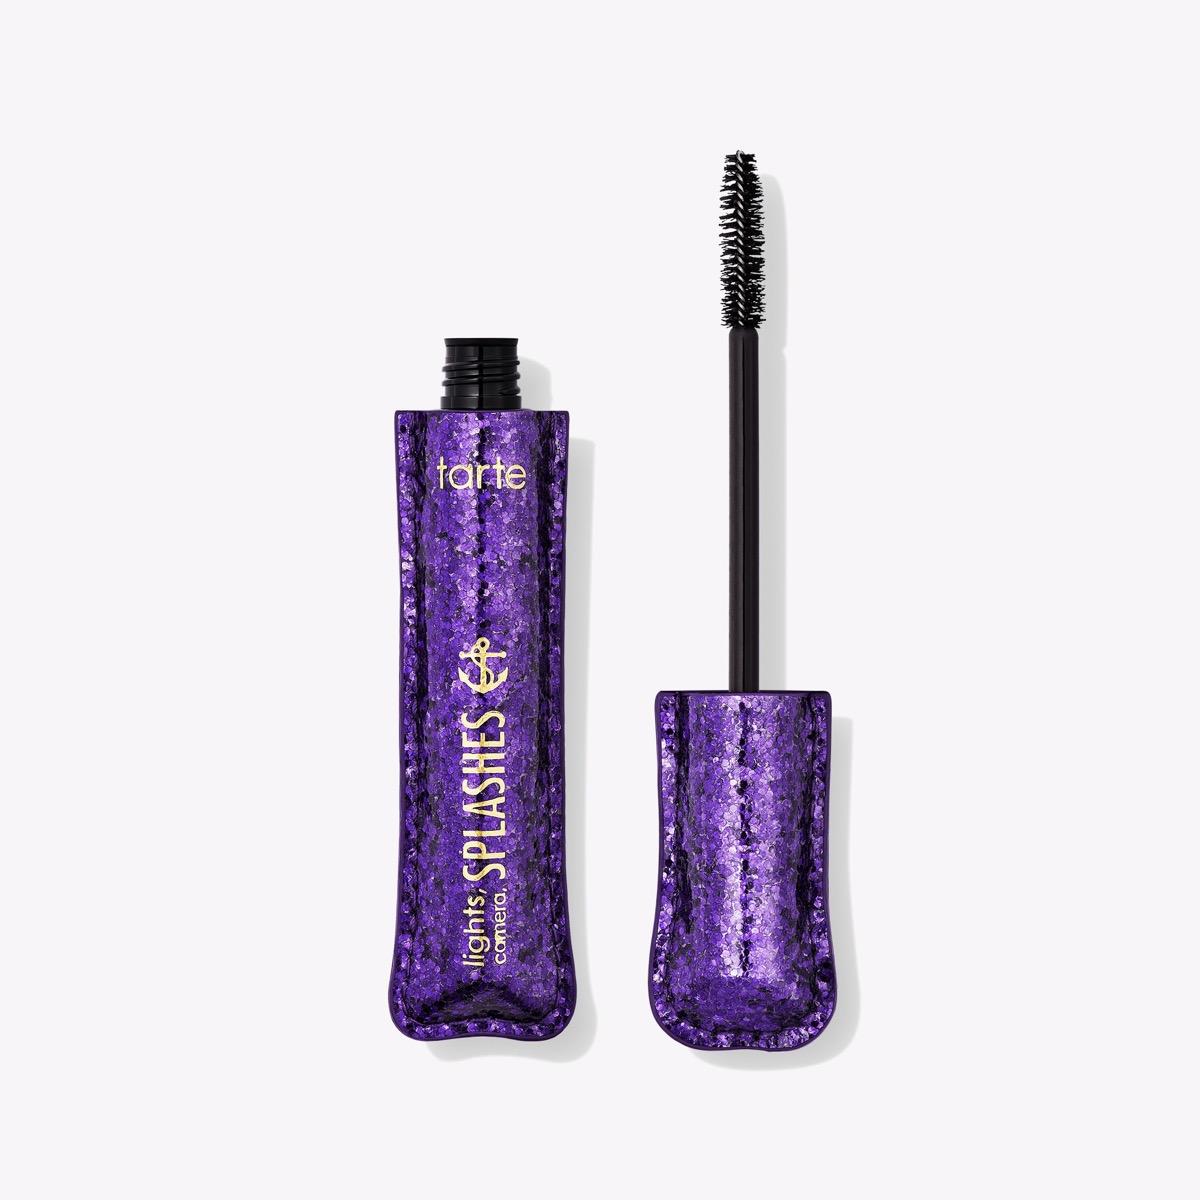 lights camera splashes waterproof tarte mascara, summer beauty products